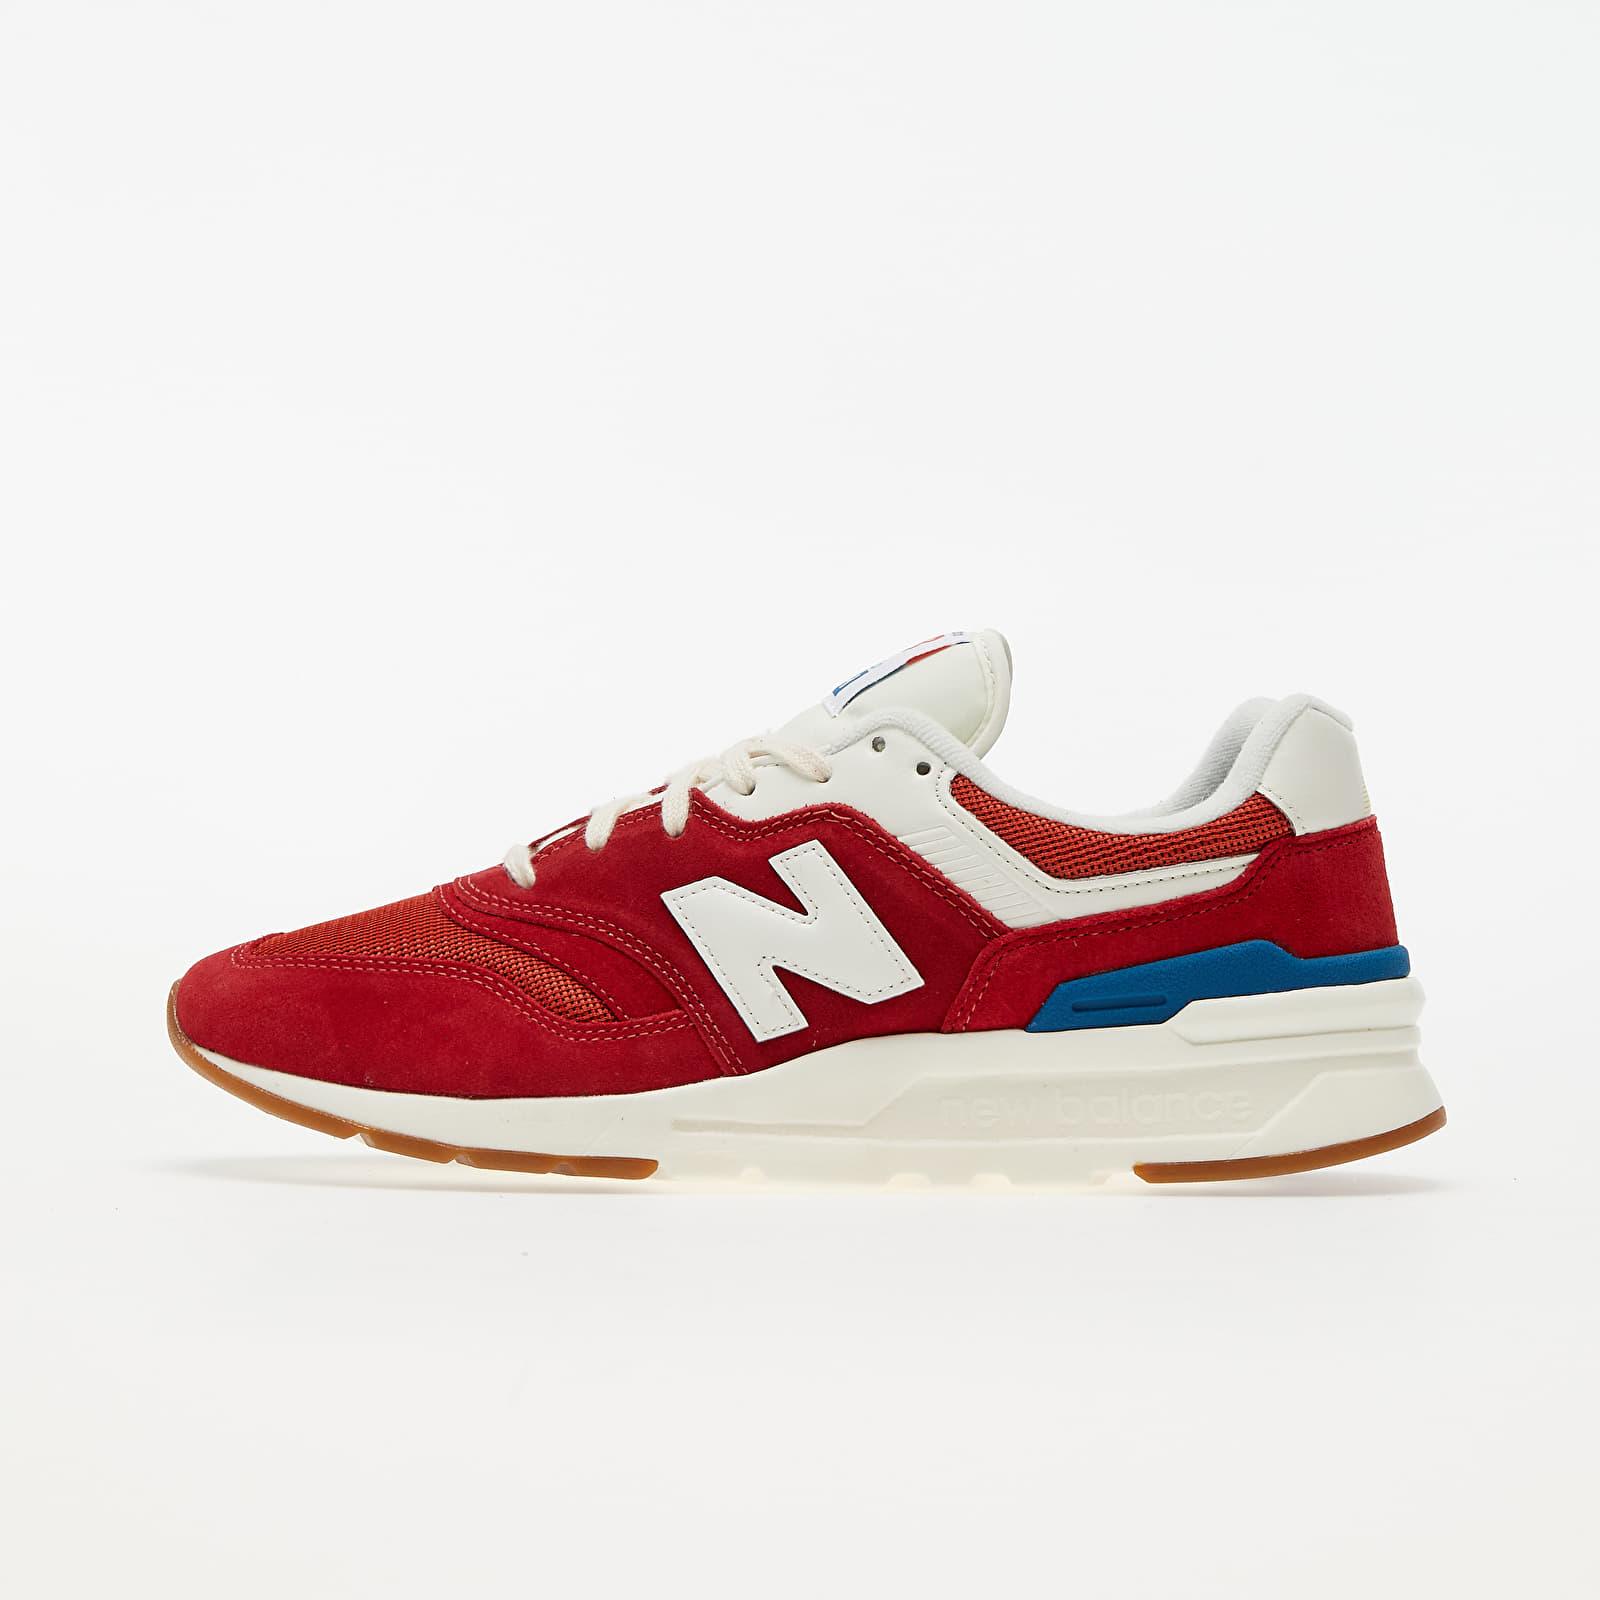 New Balance 997 Red/ White EUR 42.5